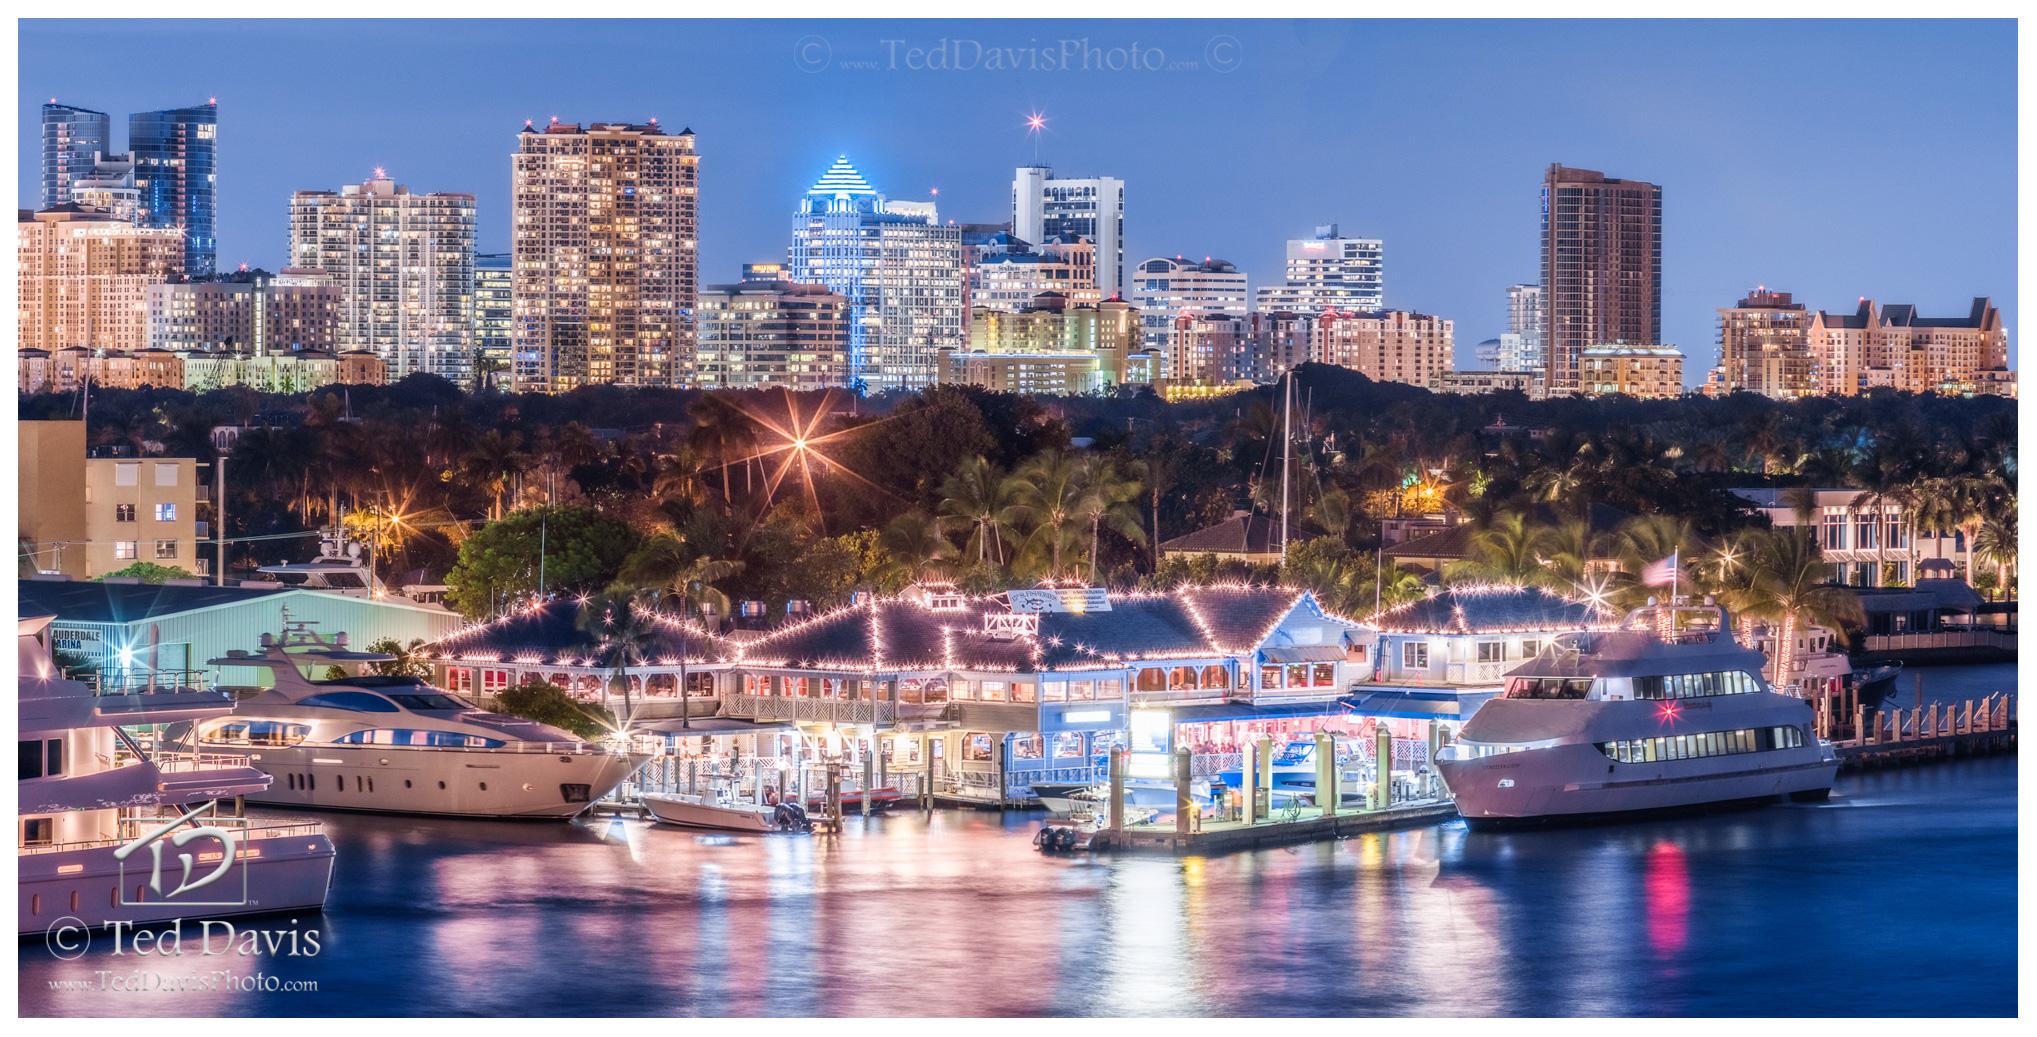 photograph, art, landscape, travel, sunset, night, sky, skyline, fish, boats, florida, coast, port, photo